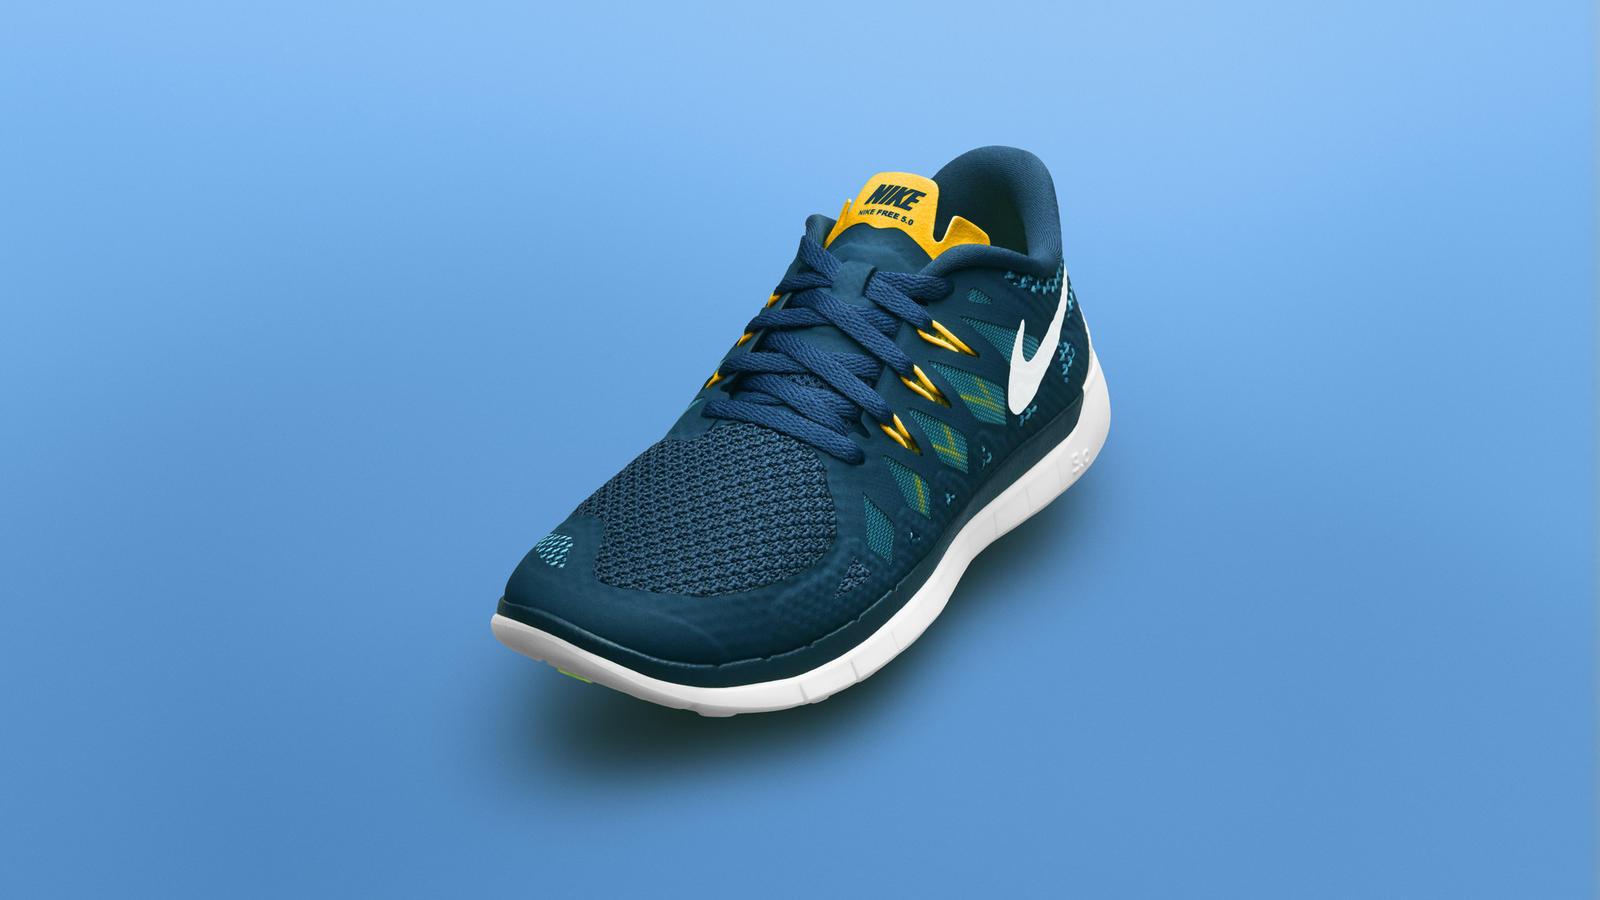 quality design b4edb d0037 Born Flexible: Nike Free 5.0 for Young Athletes - Nike News